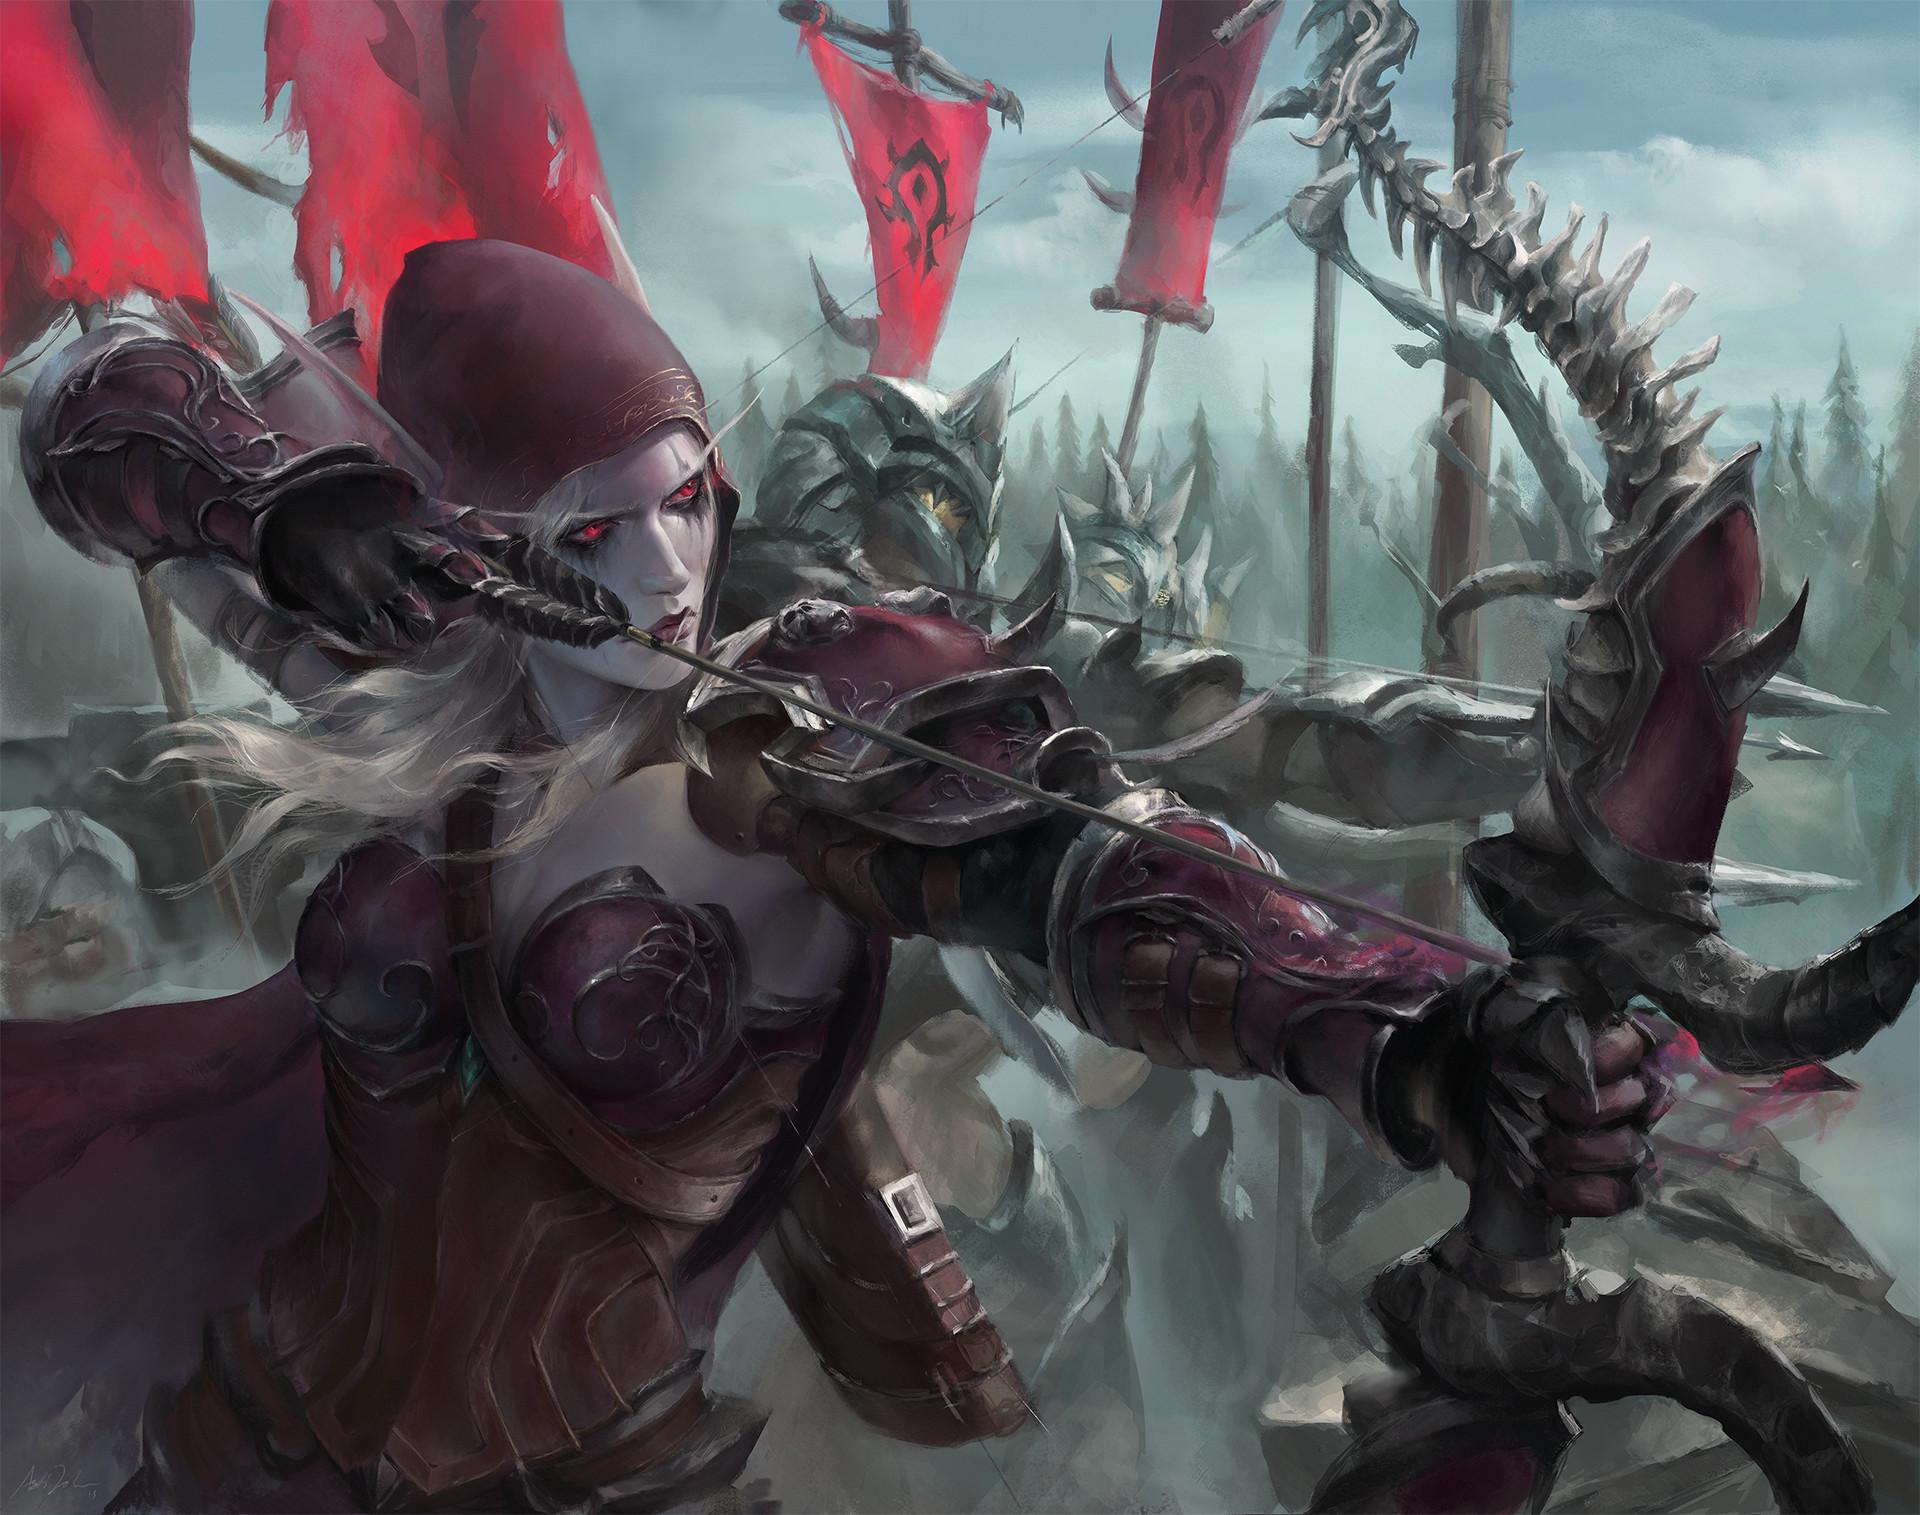 Astri Lohne Sylvanas Windrunner Fictional Character Digital Art Artwork World Of Warcraft Warcraft R 1920x1515